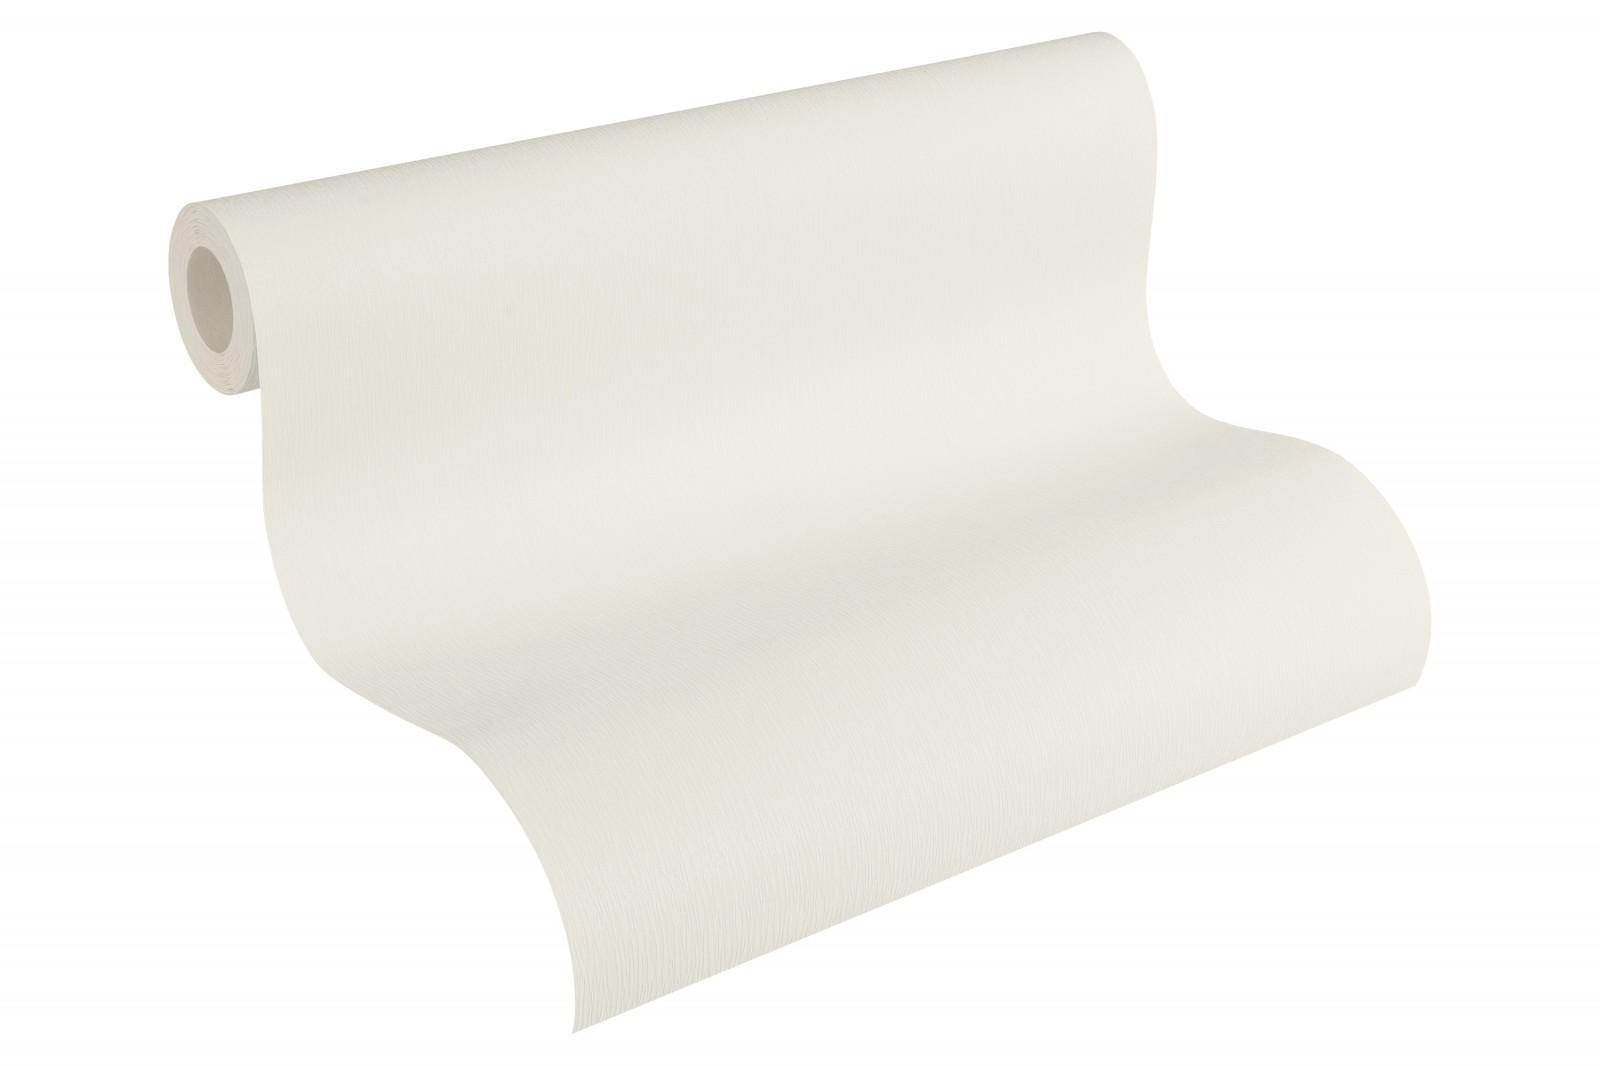 wallpaper esprit home uni cream 30280 4. Black Bedroom Furniture Sets. Home Design Ideas